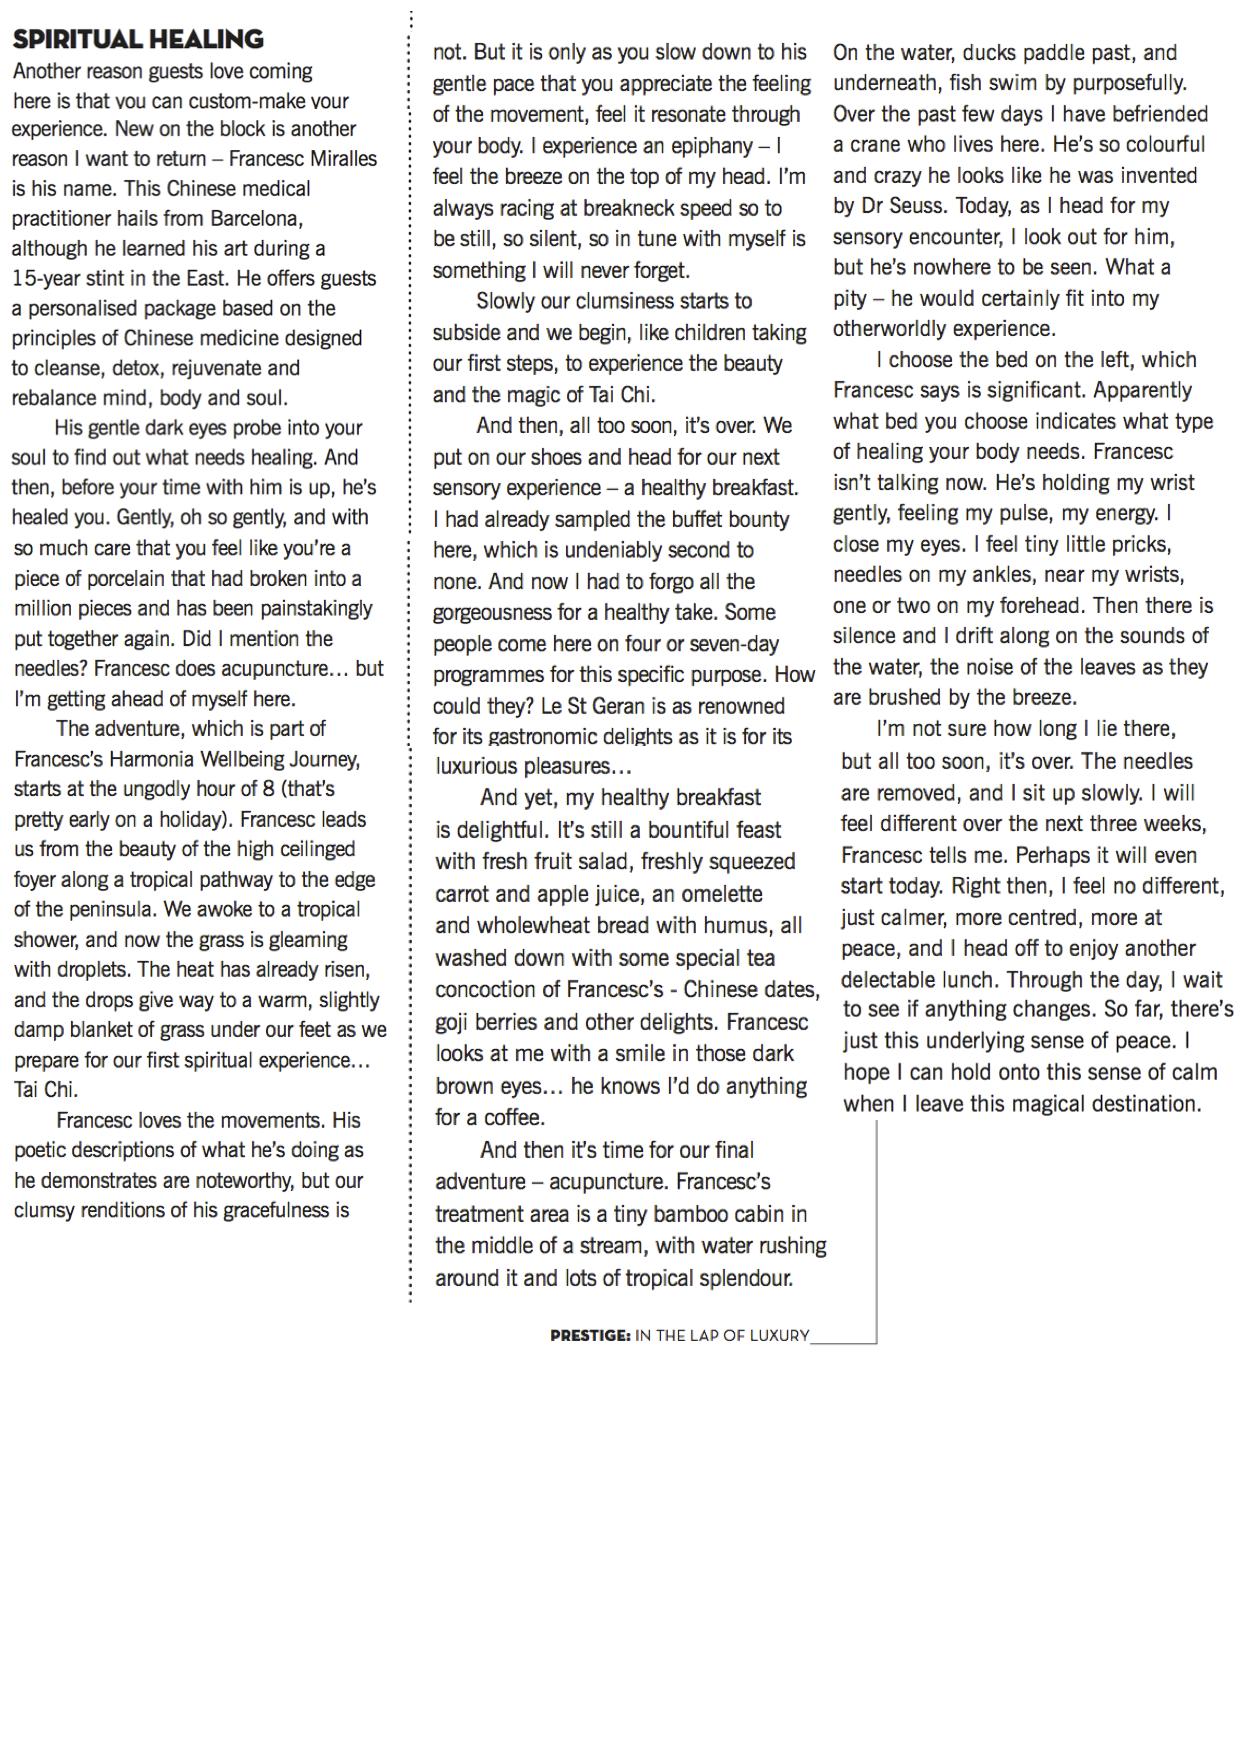 Pestige text highlighted